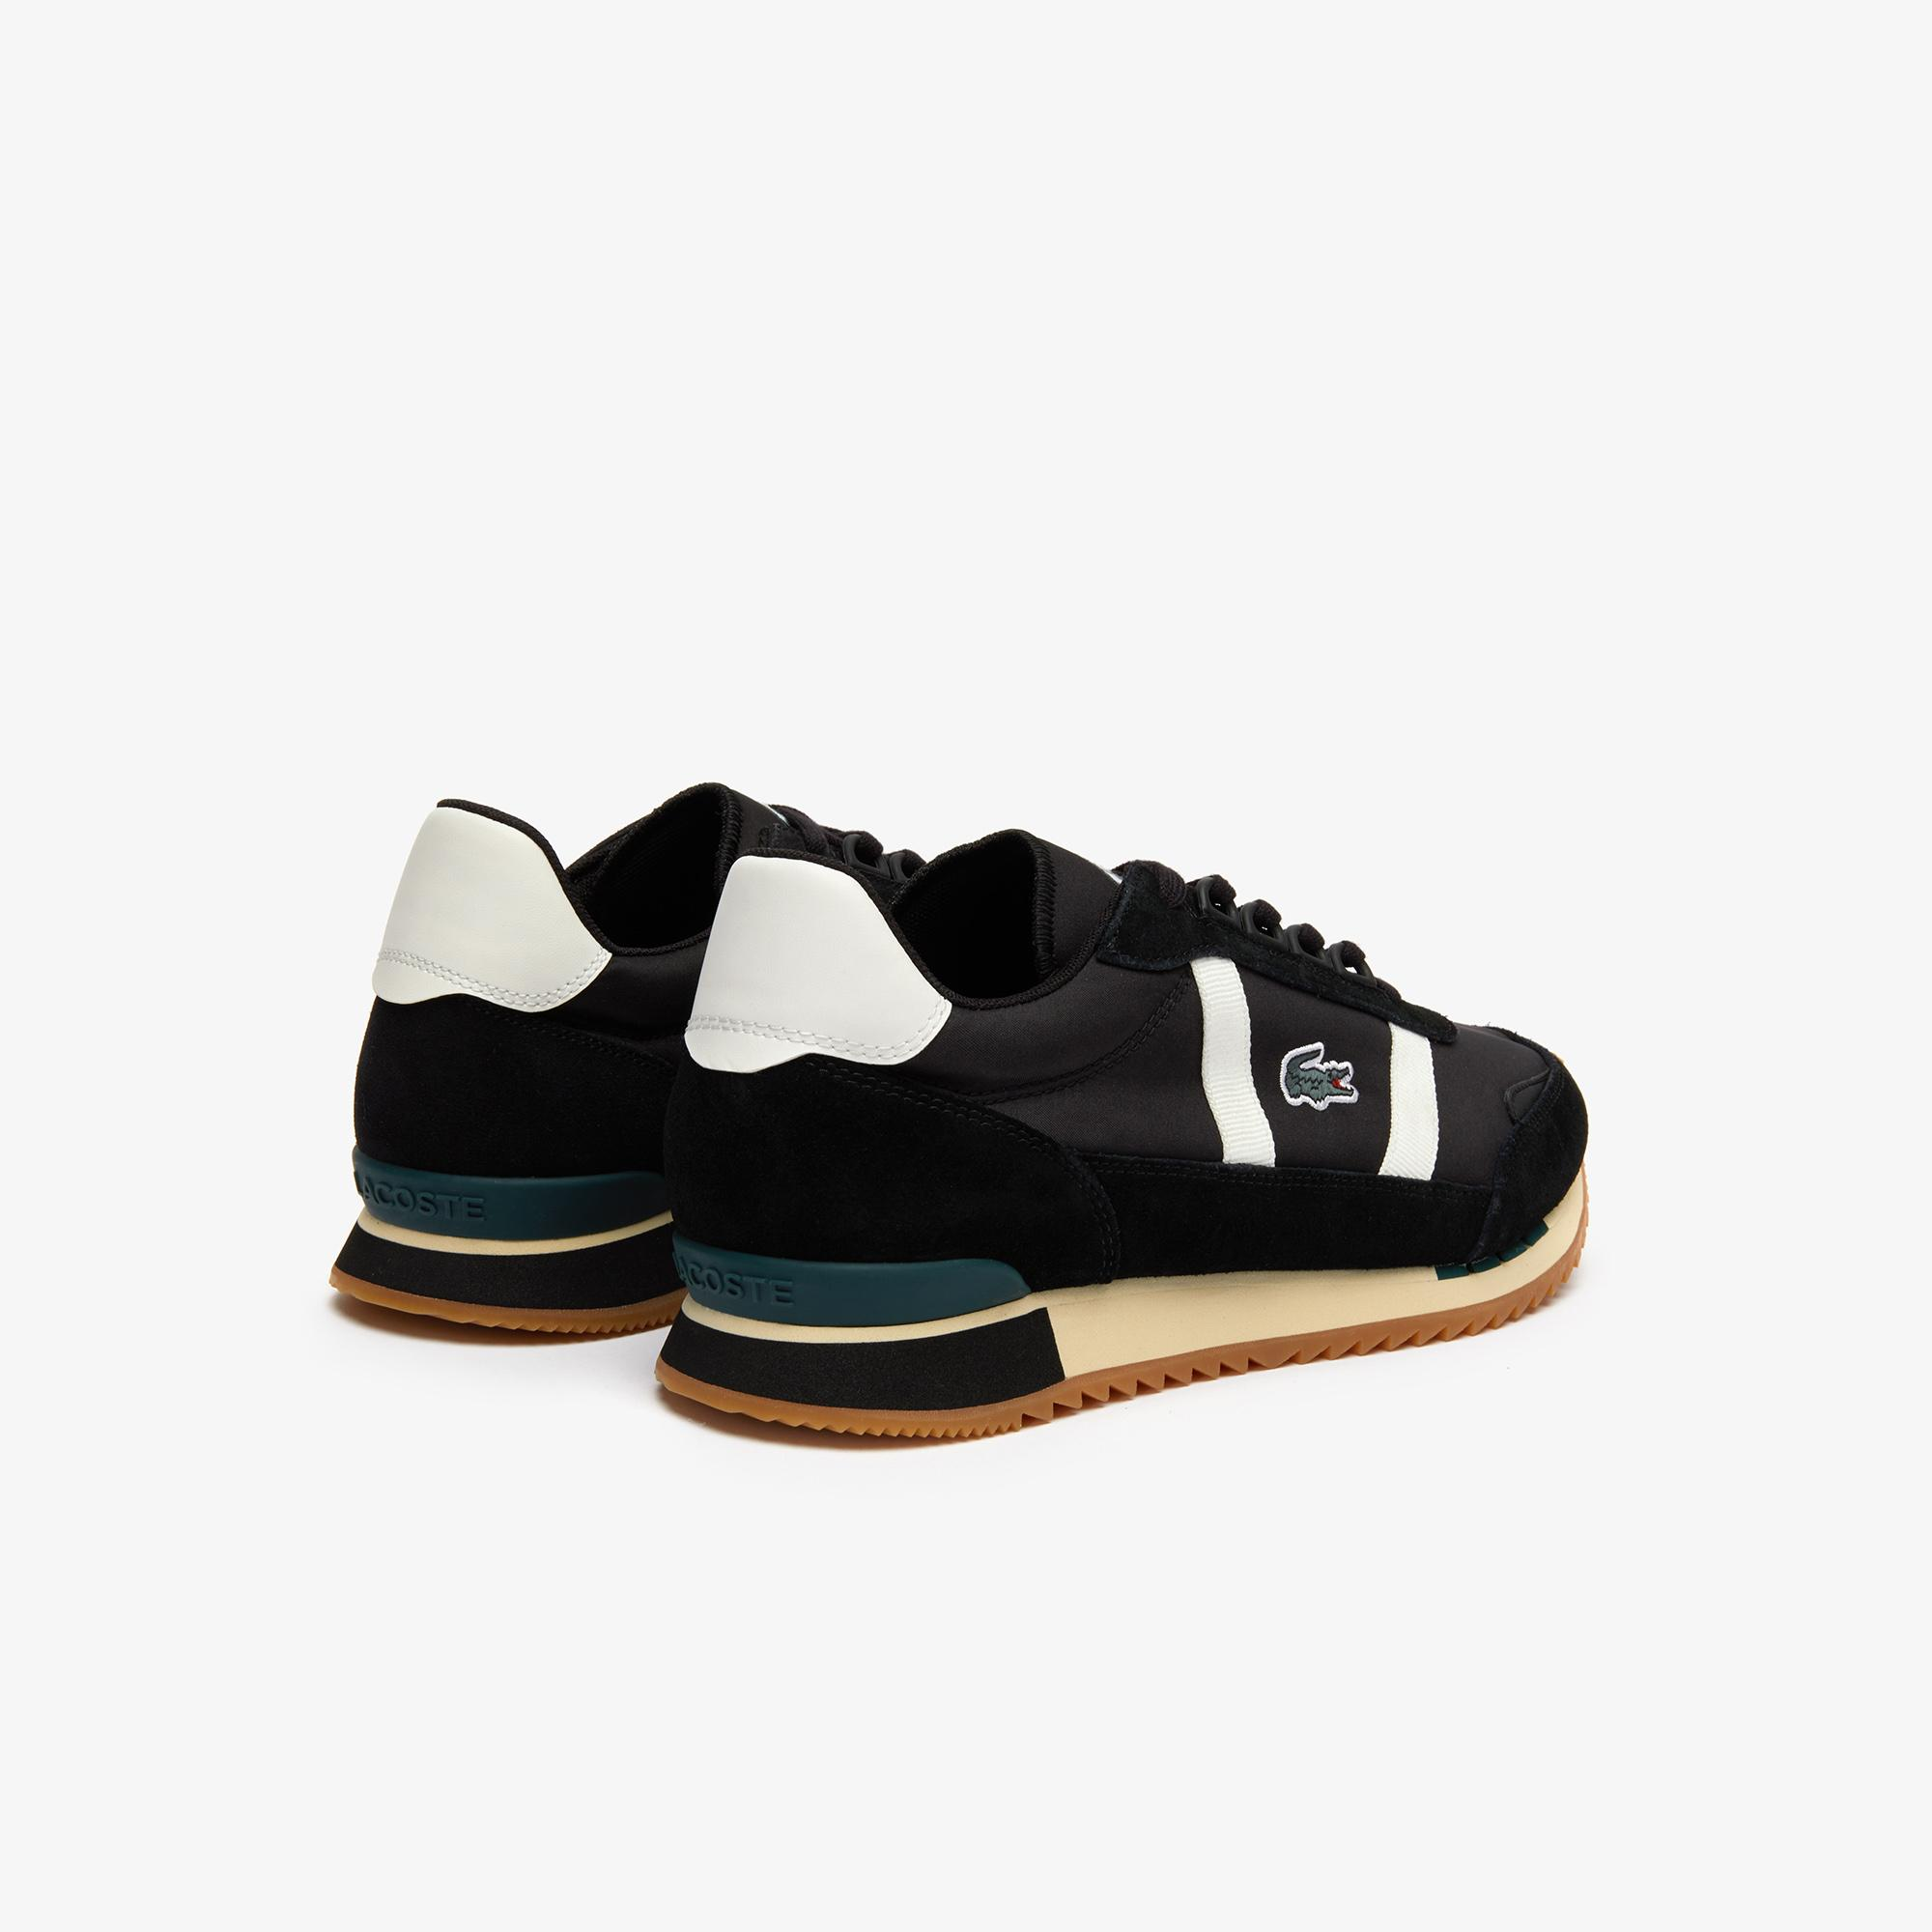 Lacoste Partner Retro 319 1 Sma Erkek Siyah - Bej Sneaker